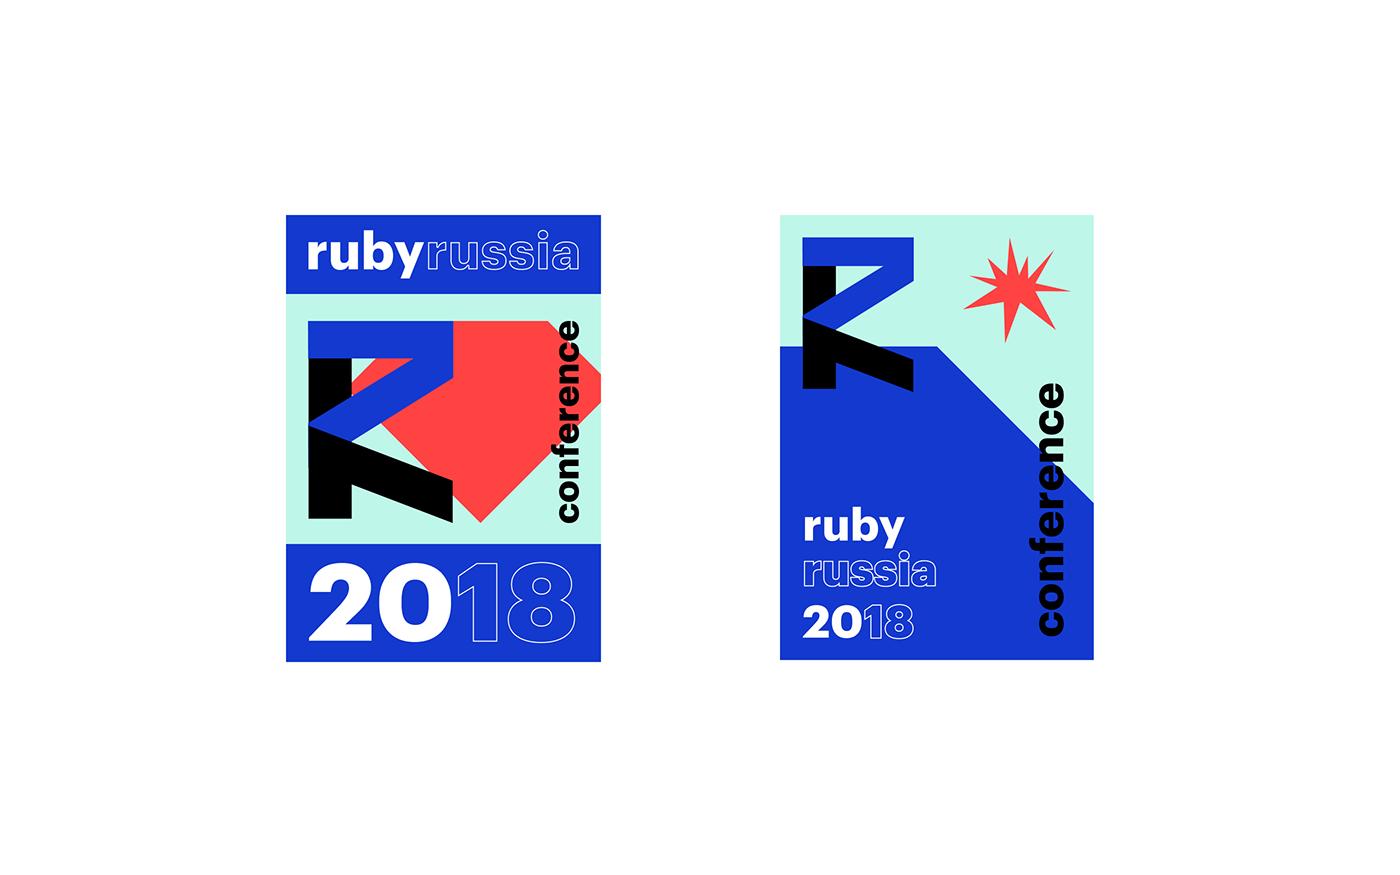 ruby Russia conference RubyOnRails ror developer programming  Event community vrgame